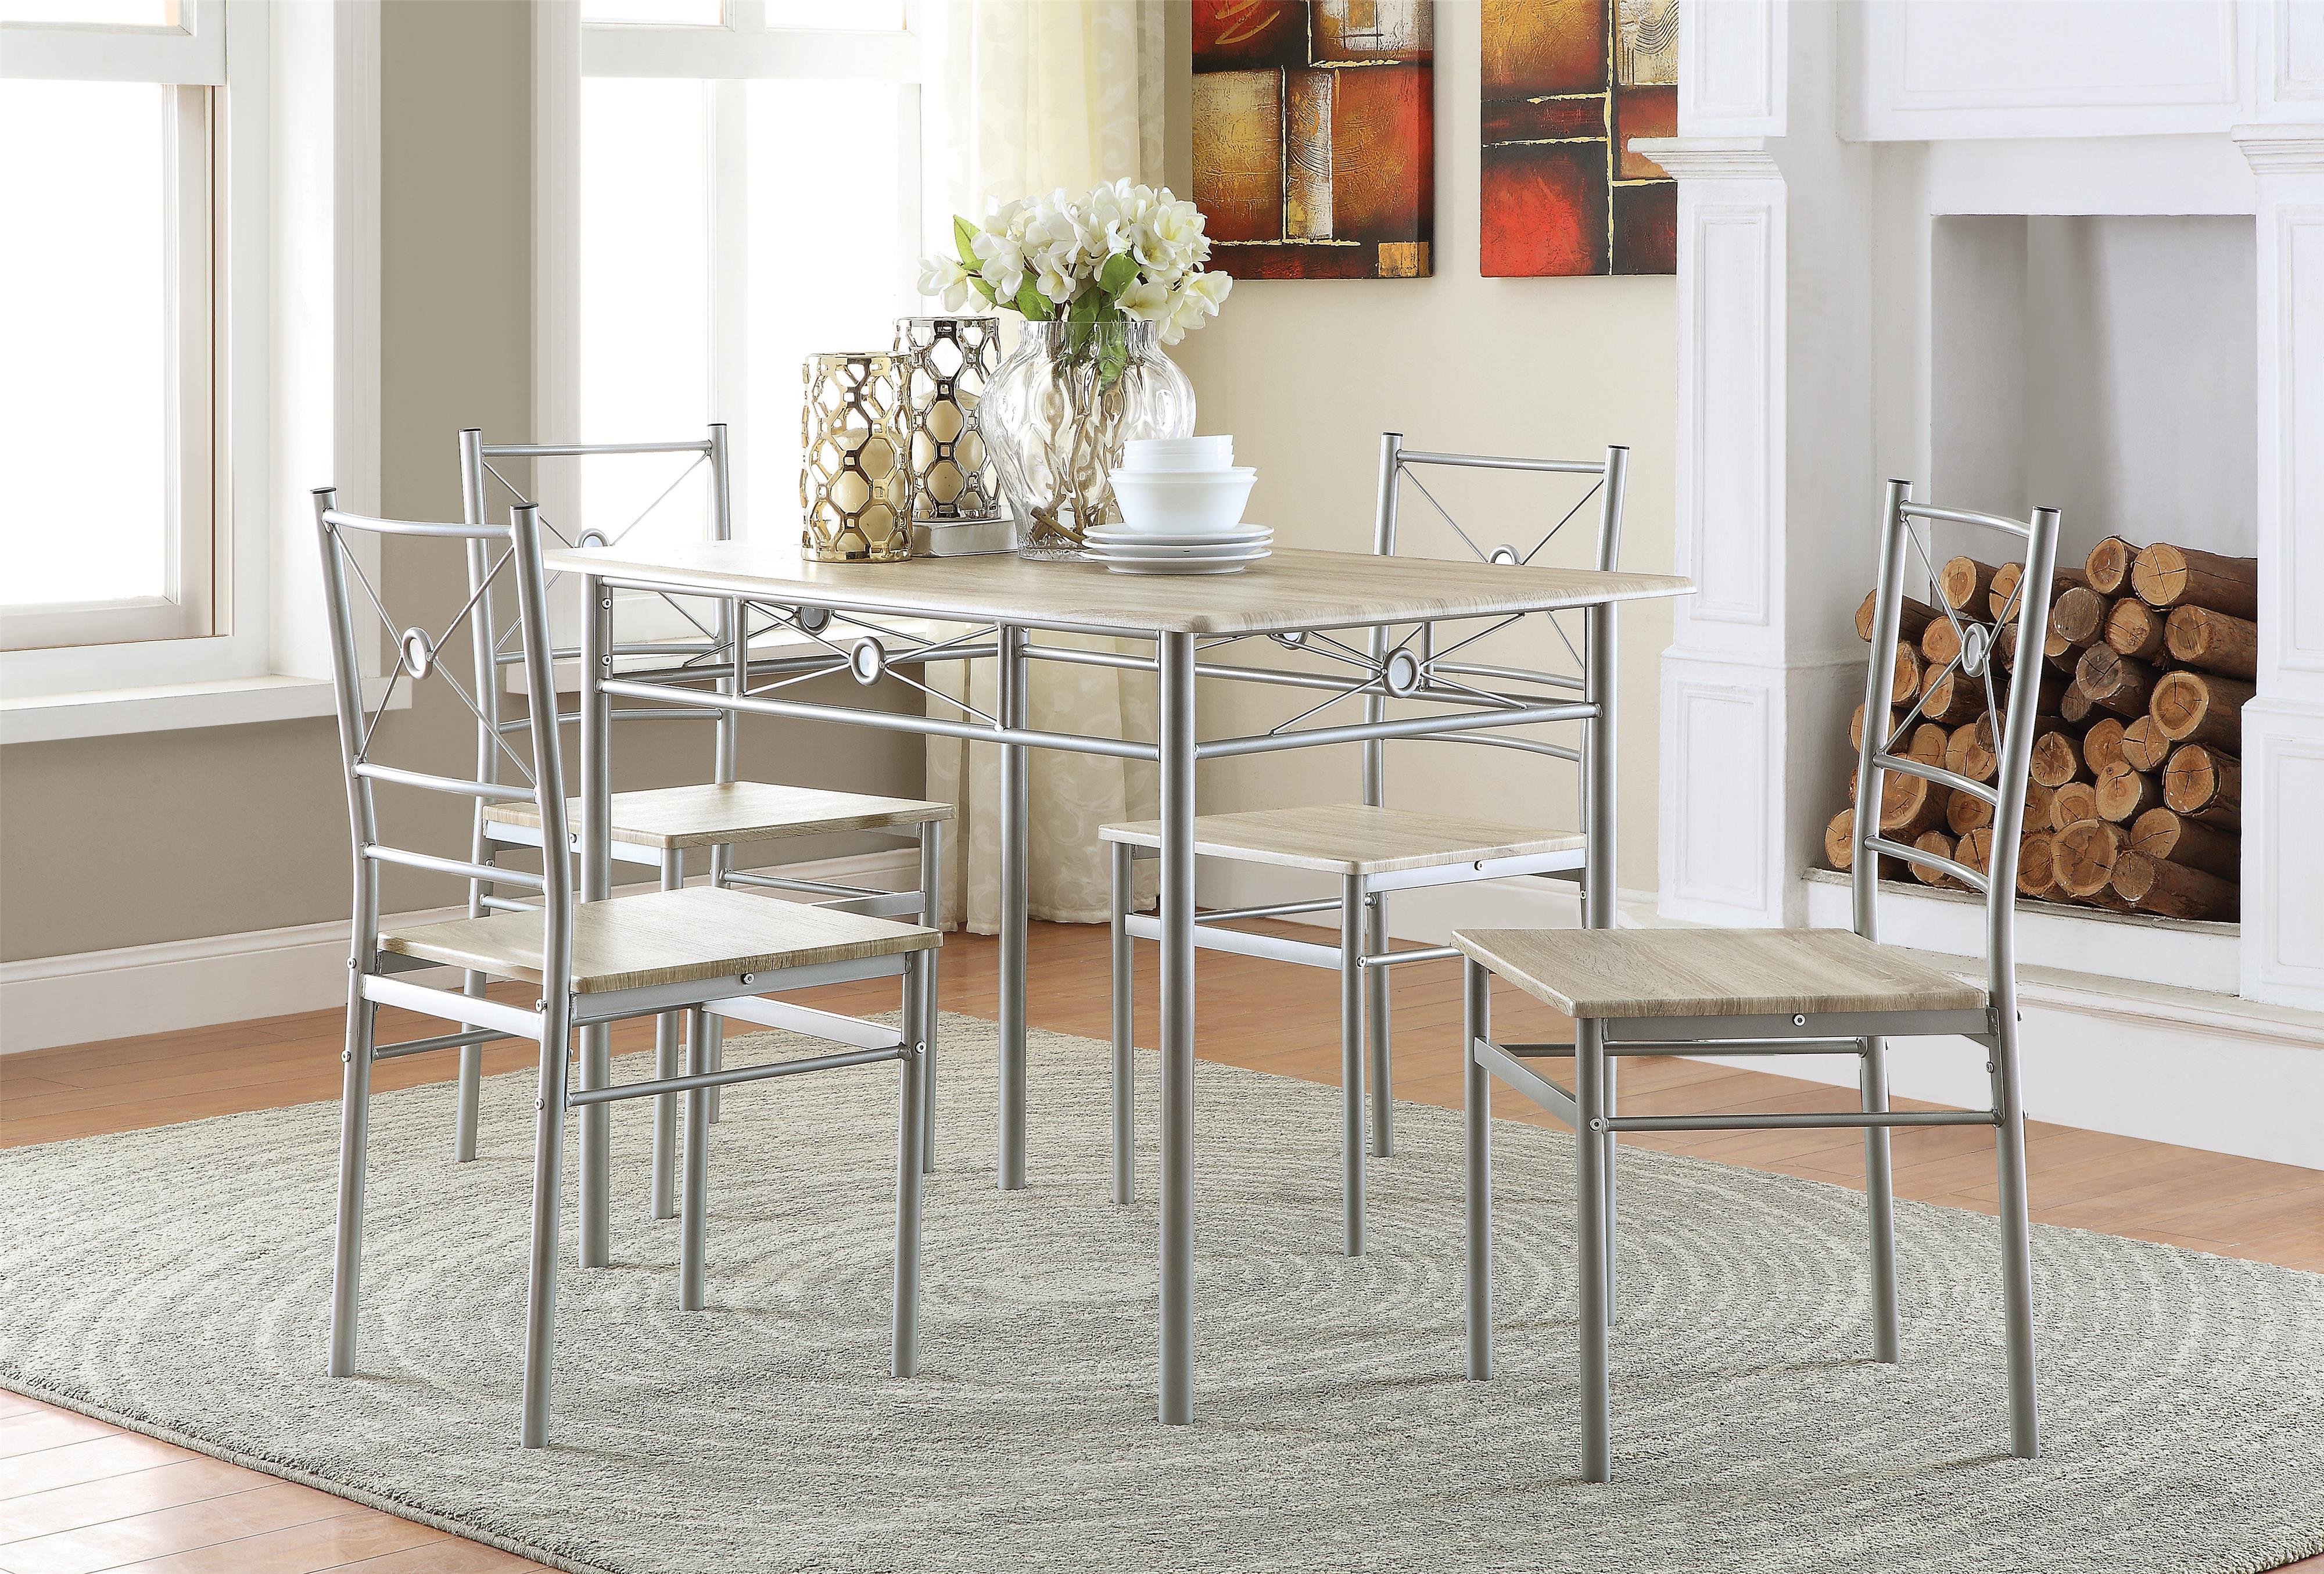 100035 (100035) by Coaster - Furniture Superstore - NM - Coaster 100035 Dealer